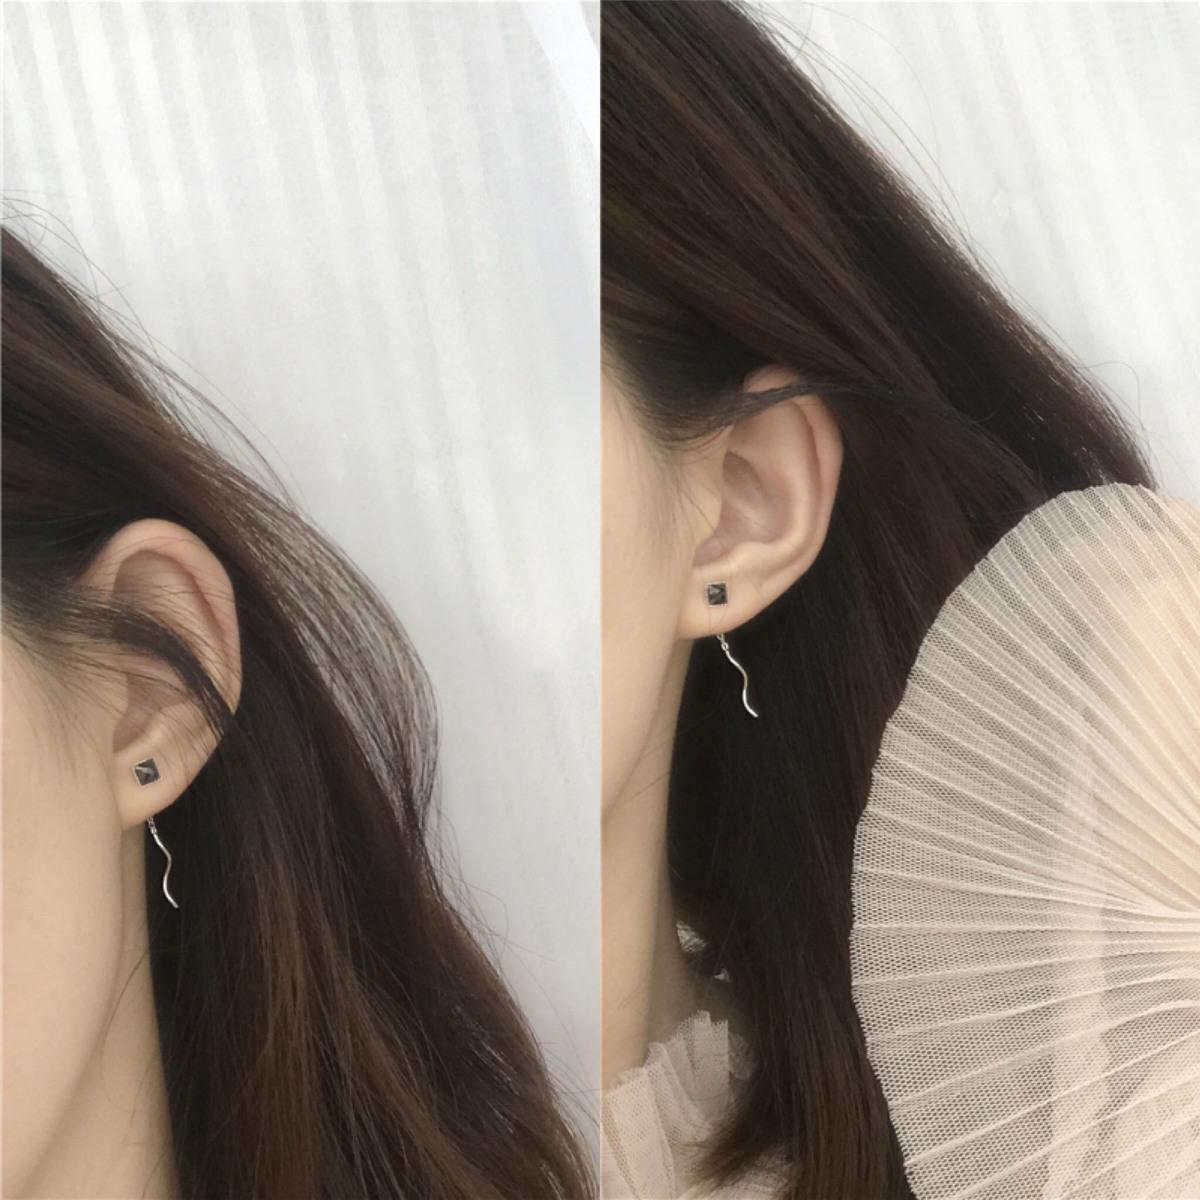 JewelryS925水晶波浪耳坠方形耳线气质耳环纯银黑色女包邮